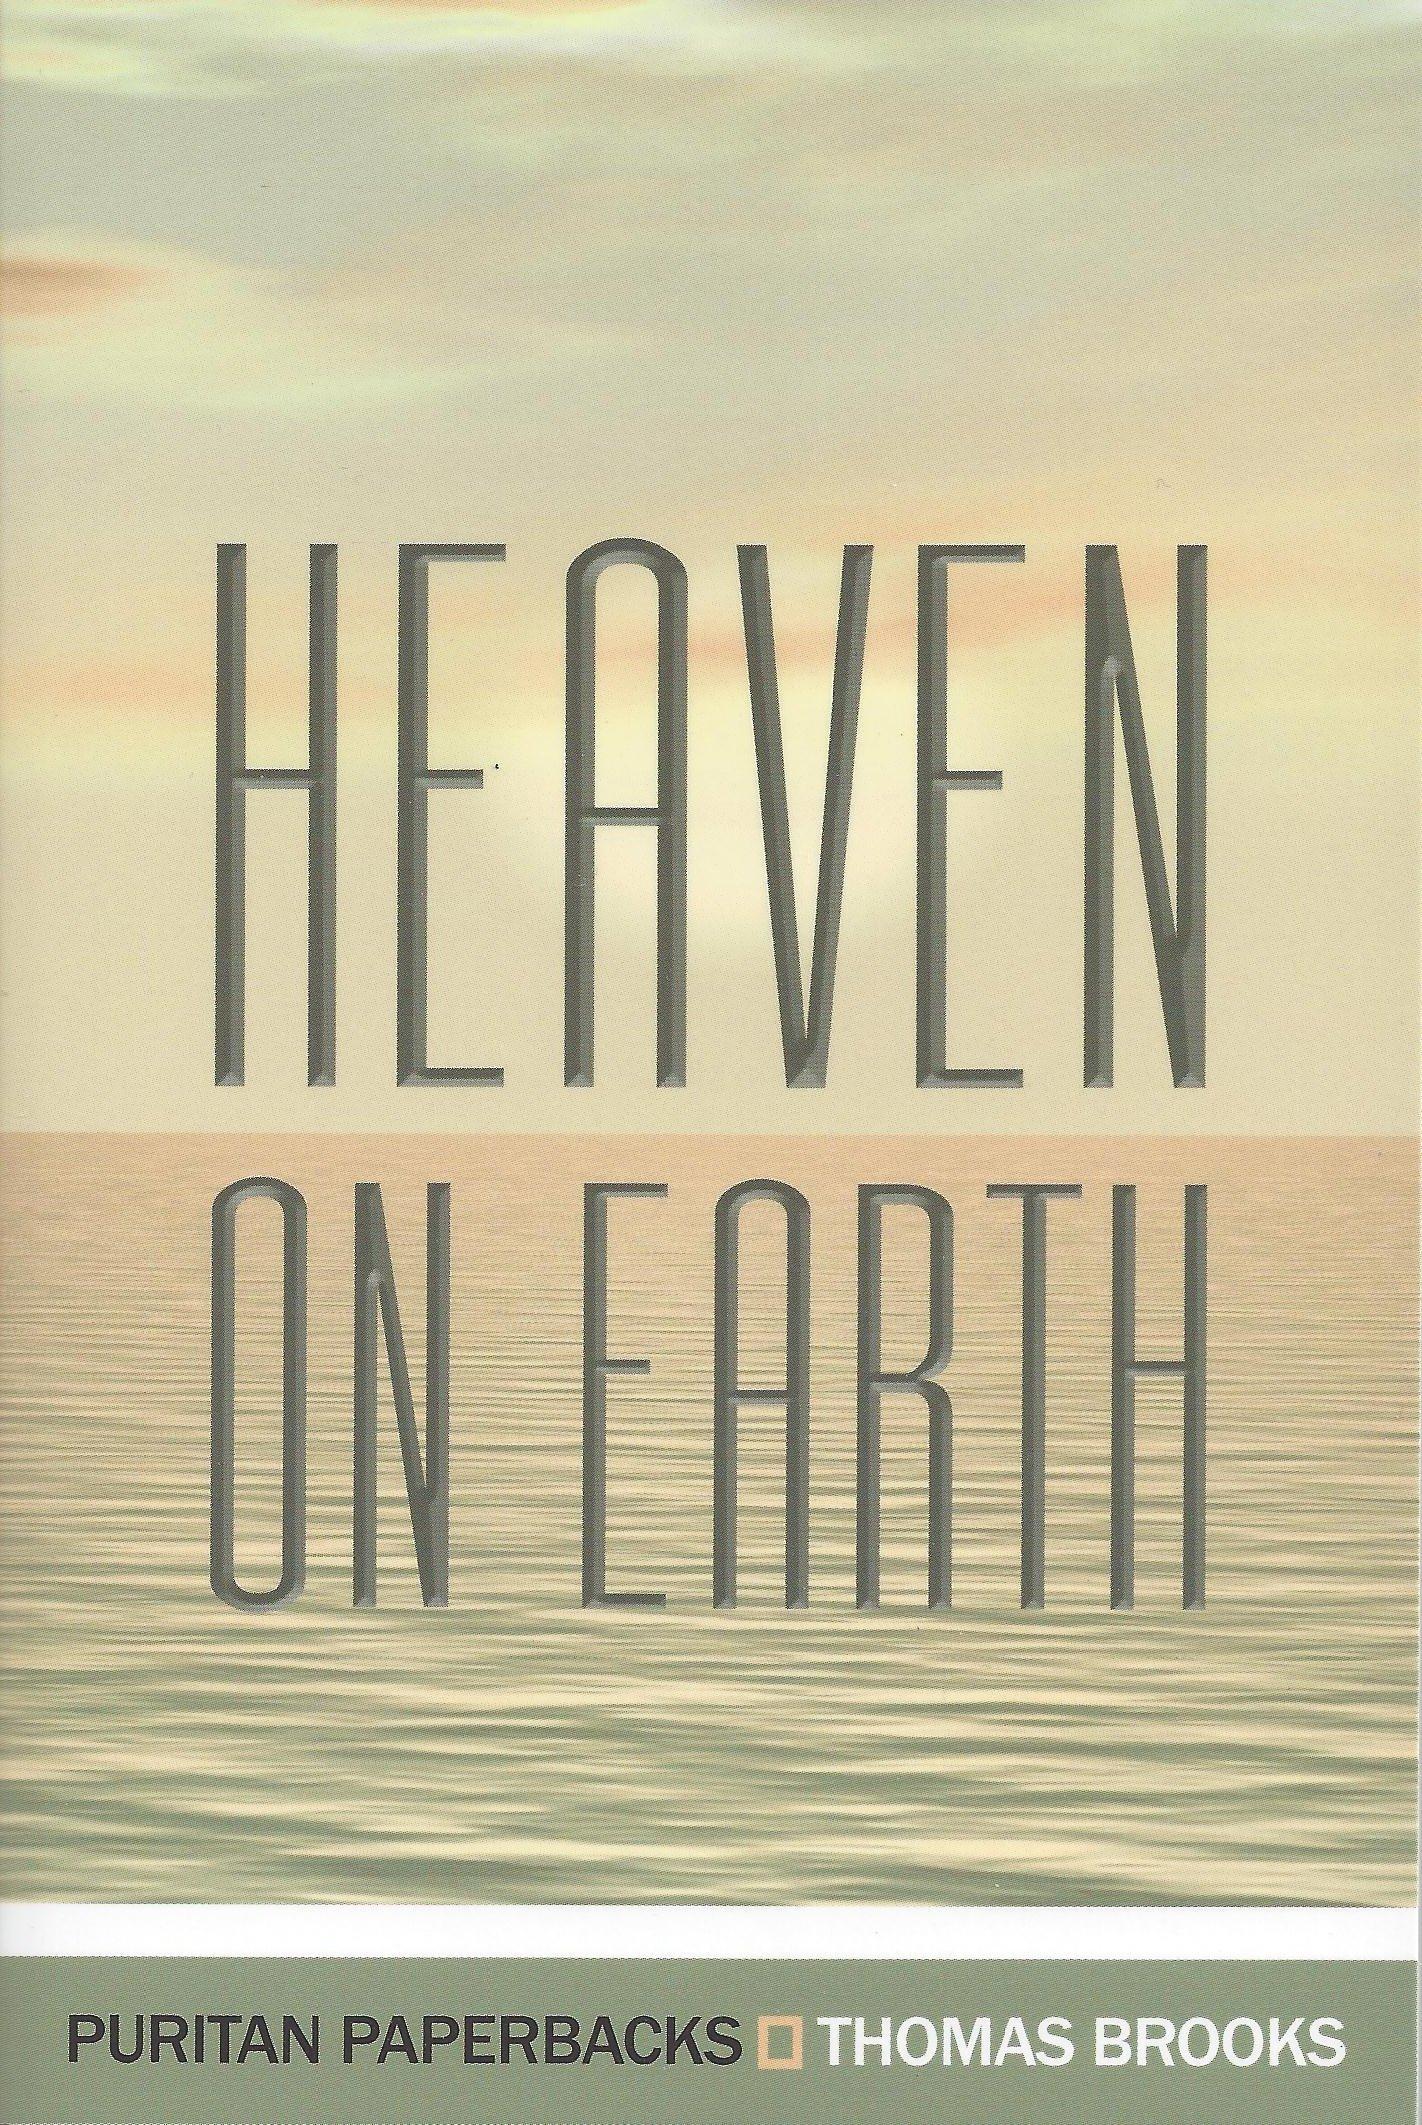 Heaven on Earth (Puritan Paperbacks)